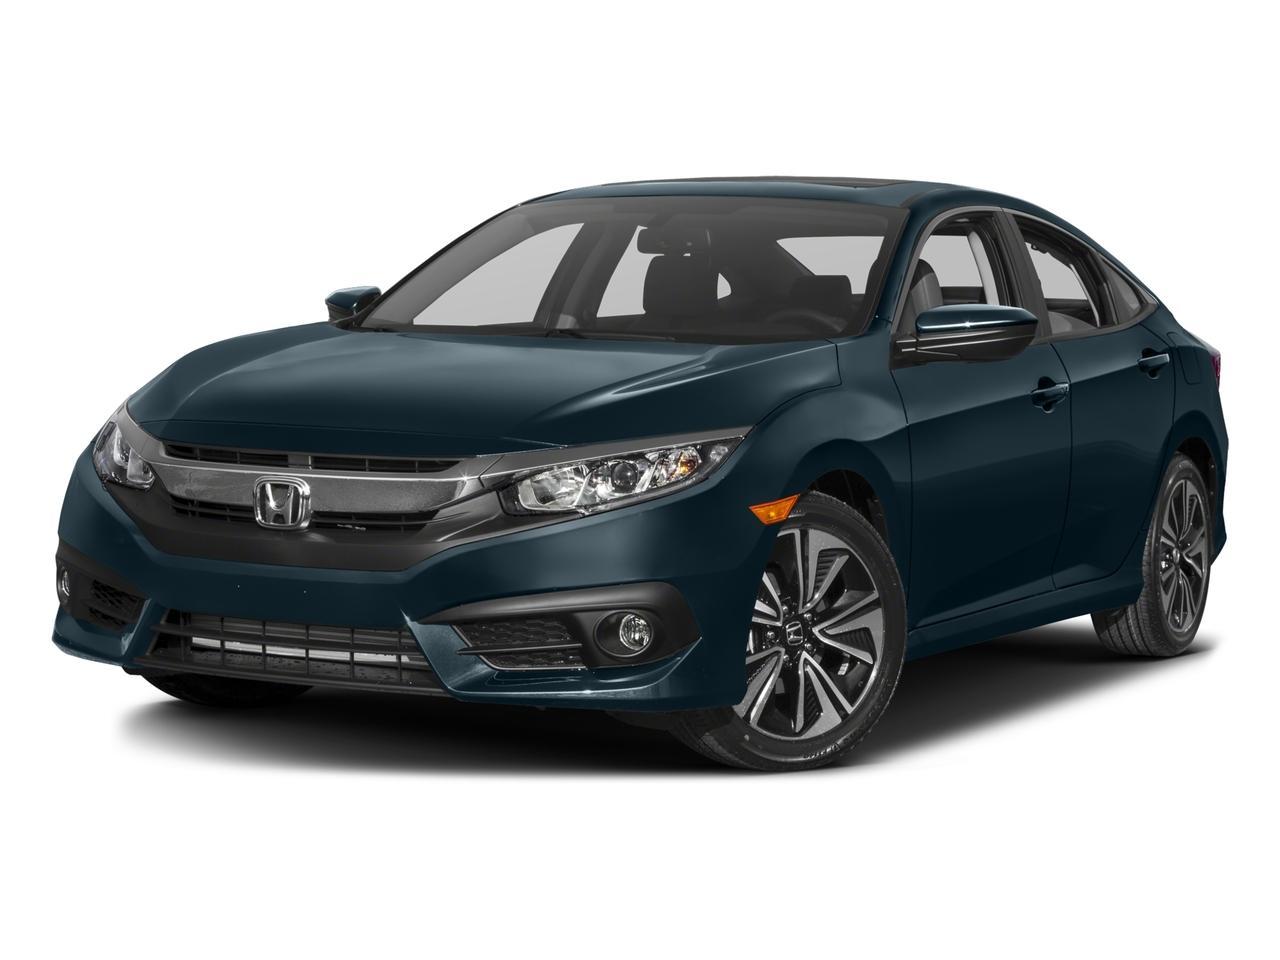 2016 Honda Civic Sedan Vehicle Photo in Temple, TX 76502